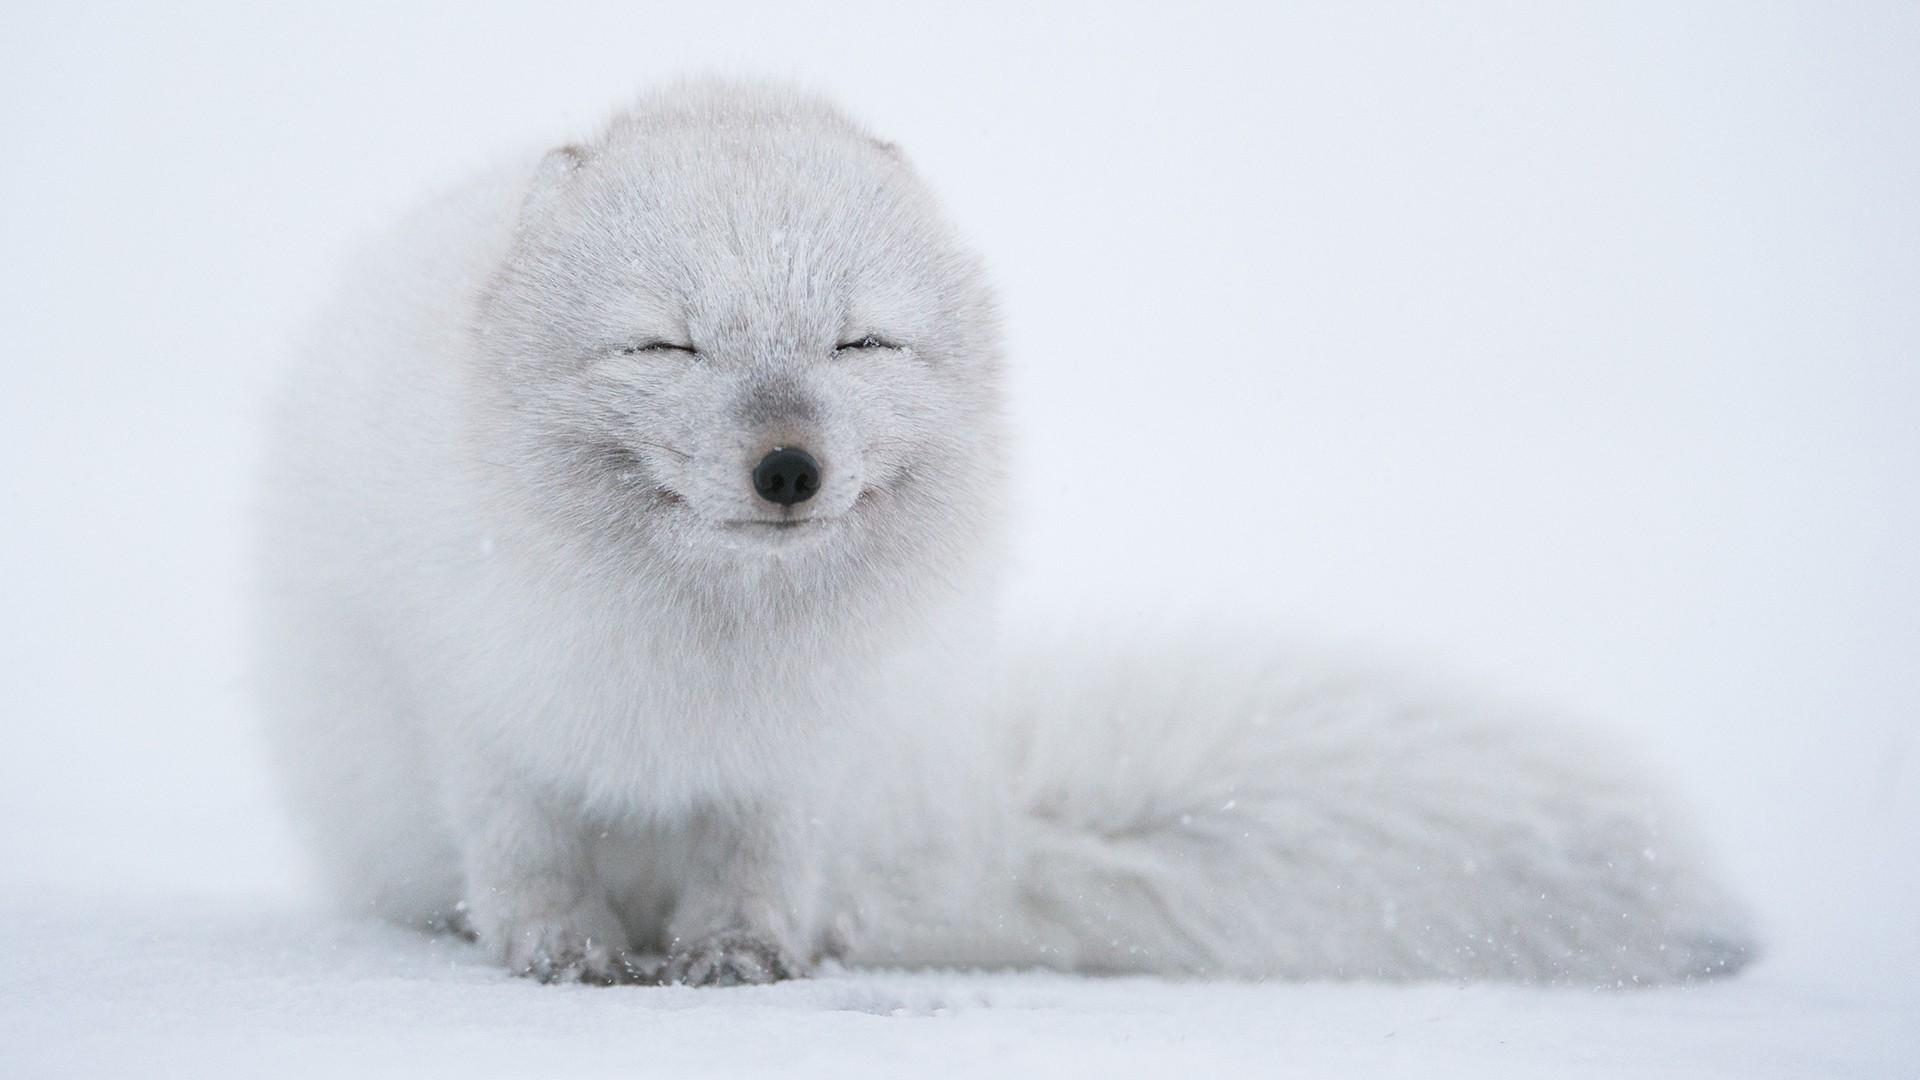 Animals Snow Fox Arctic Weather Mammal 1920x1080 Px Vertebrate Polar Bear Dog Like